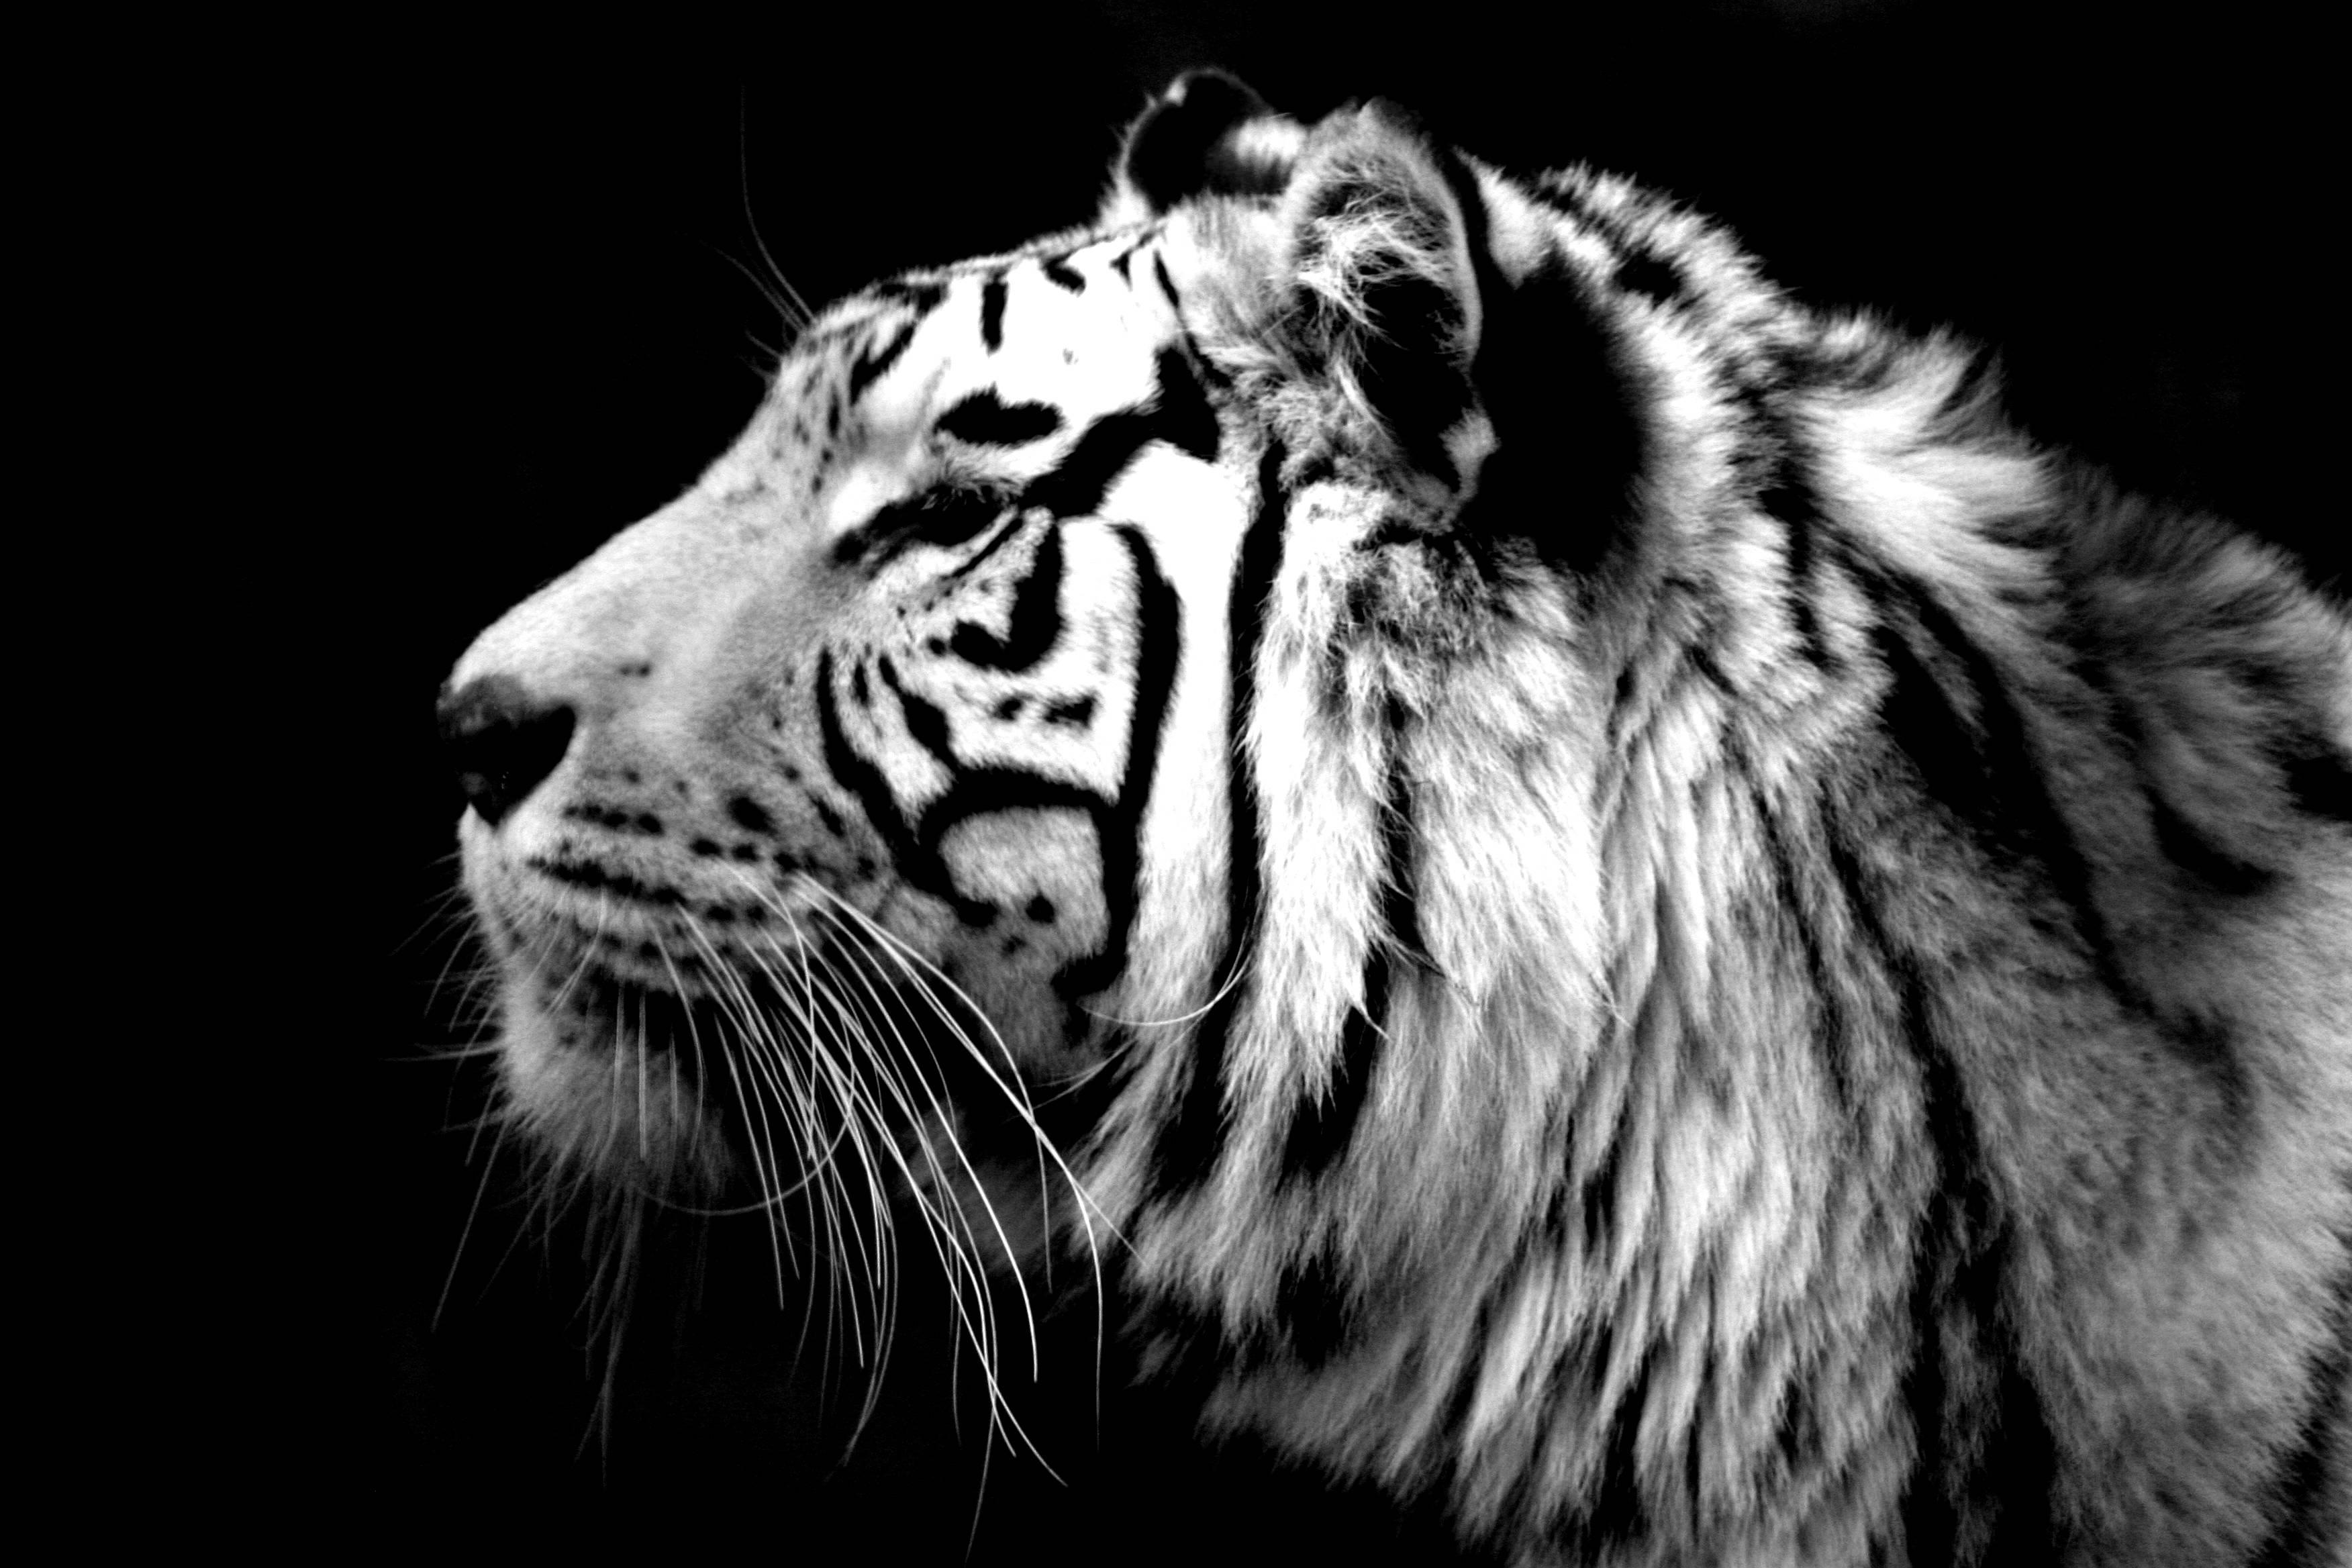 8k Animal Wallpaper Download: Tiger Face Wallpapers